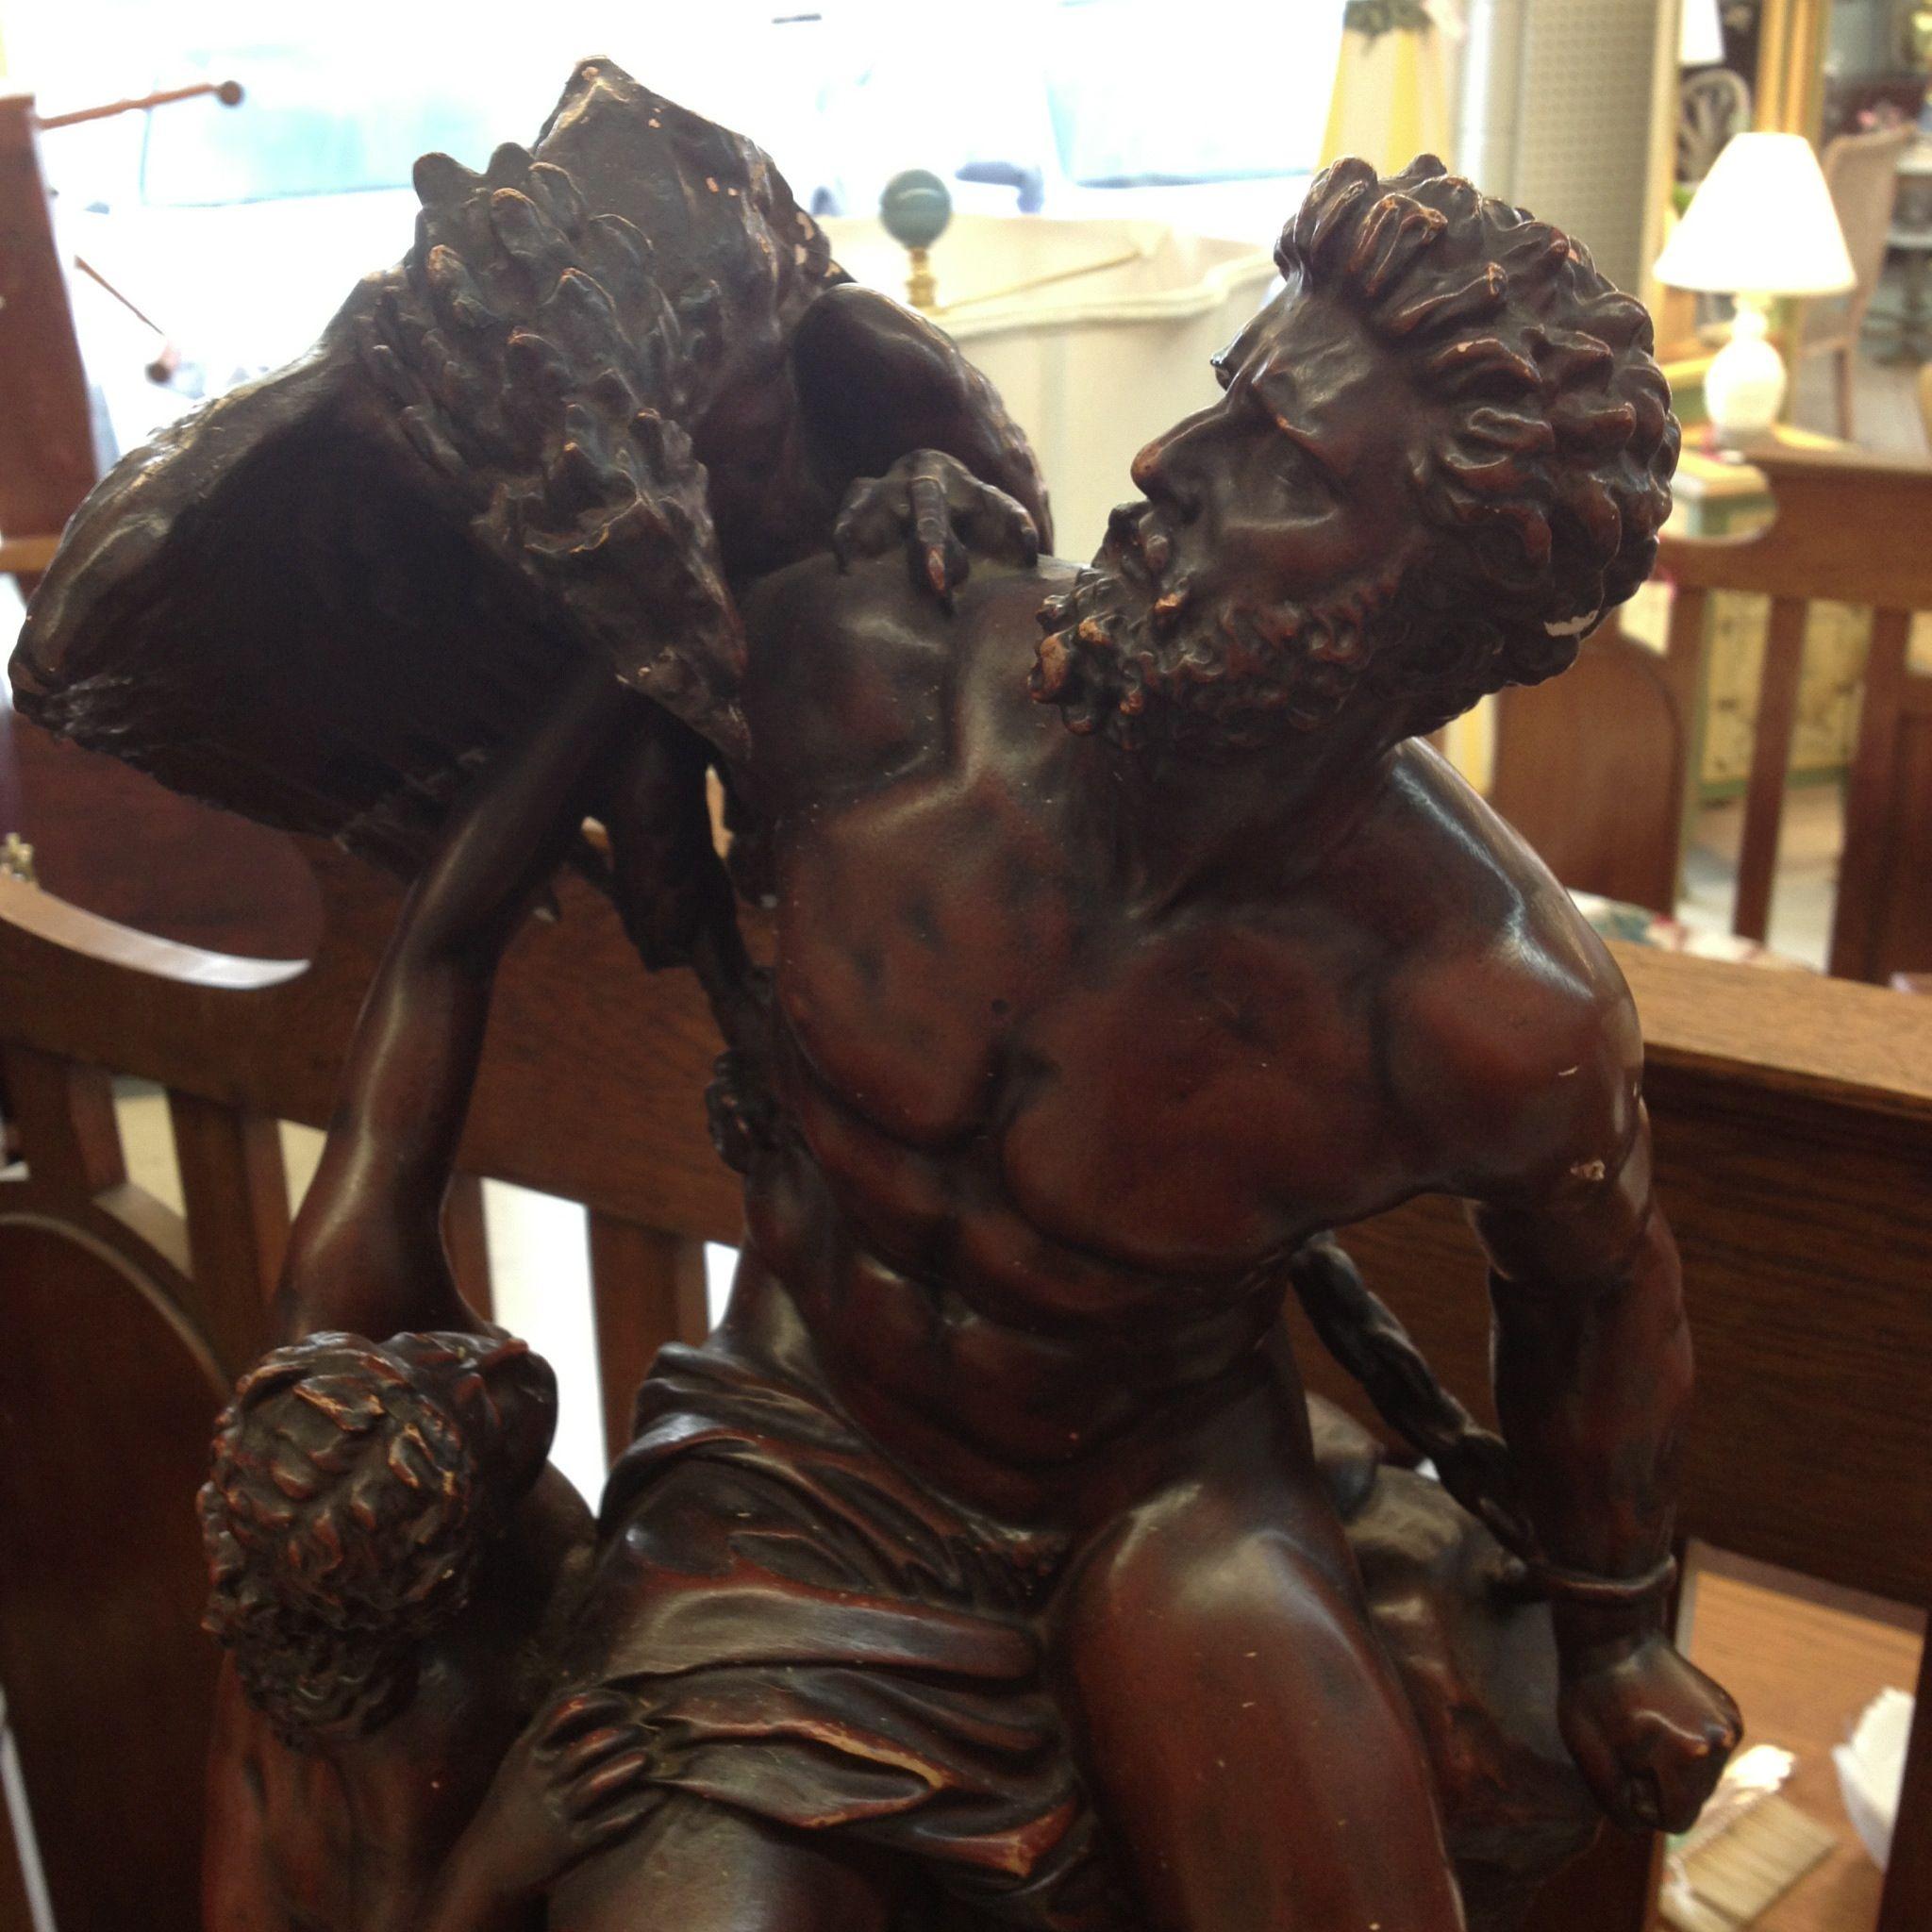 I saw a replica statue of my Prometheus tattoo's ...